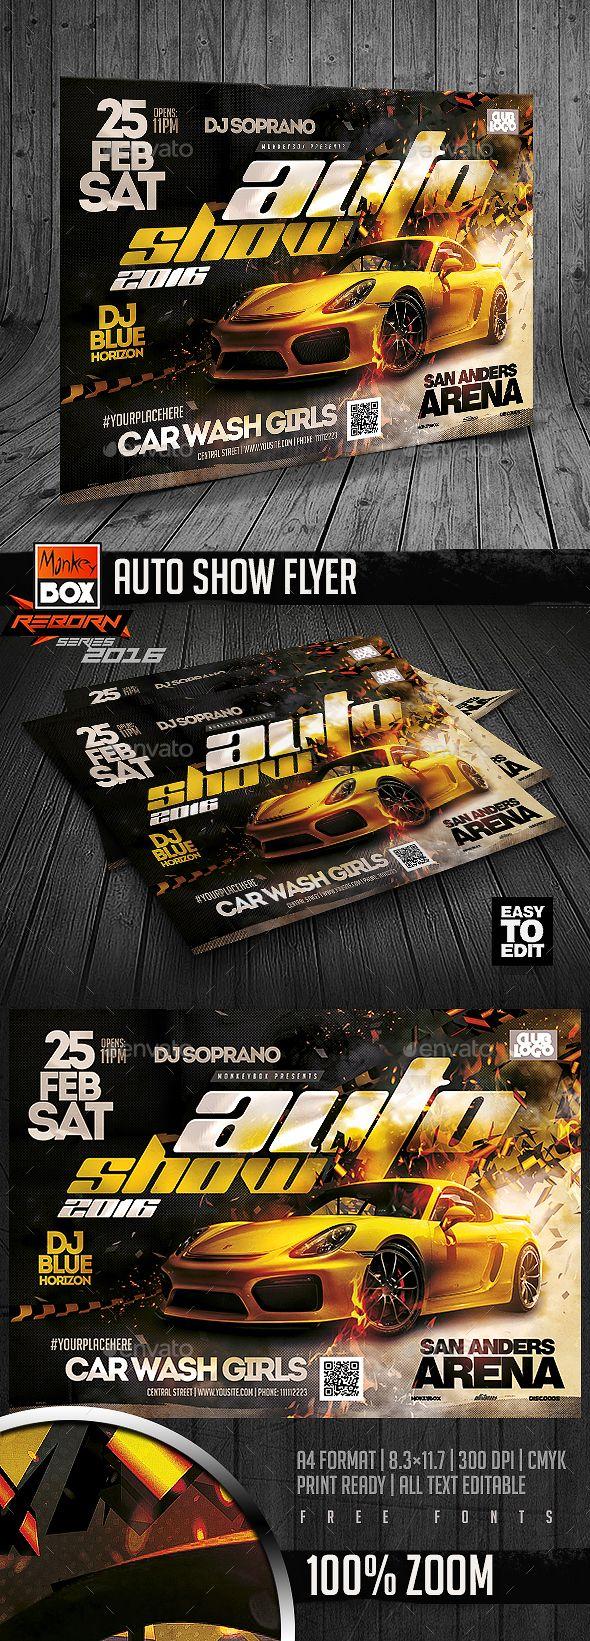 Auto Show Flyer | Lava, Photoshop y Volantes